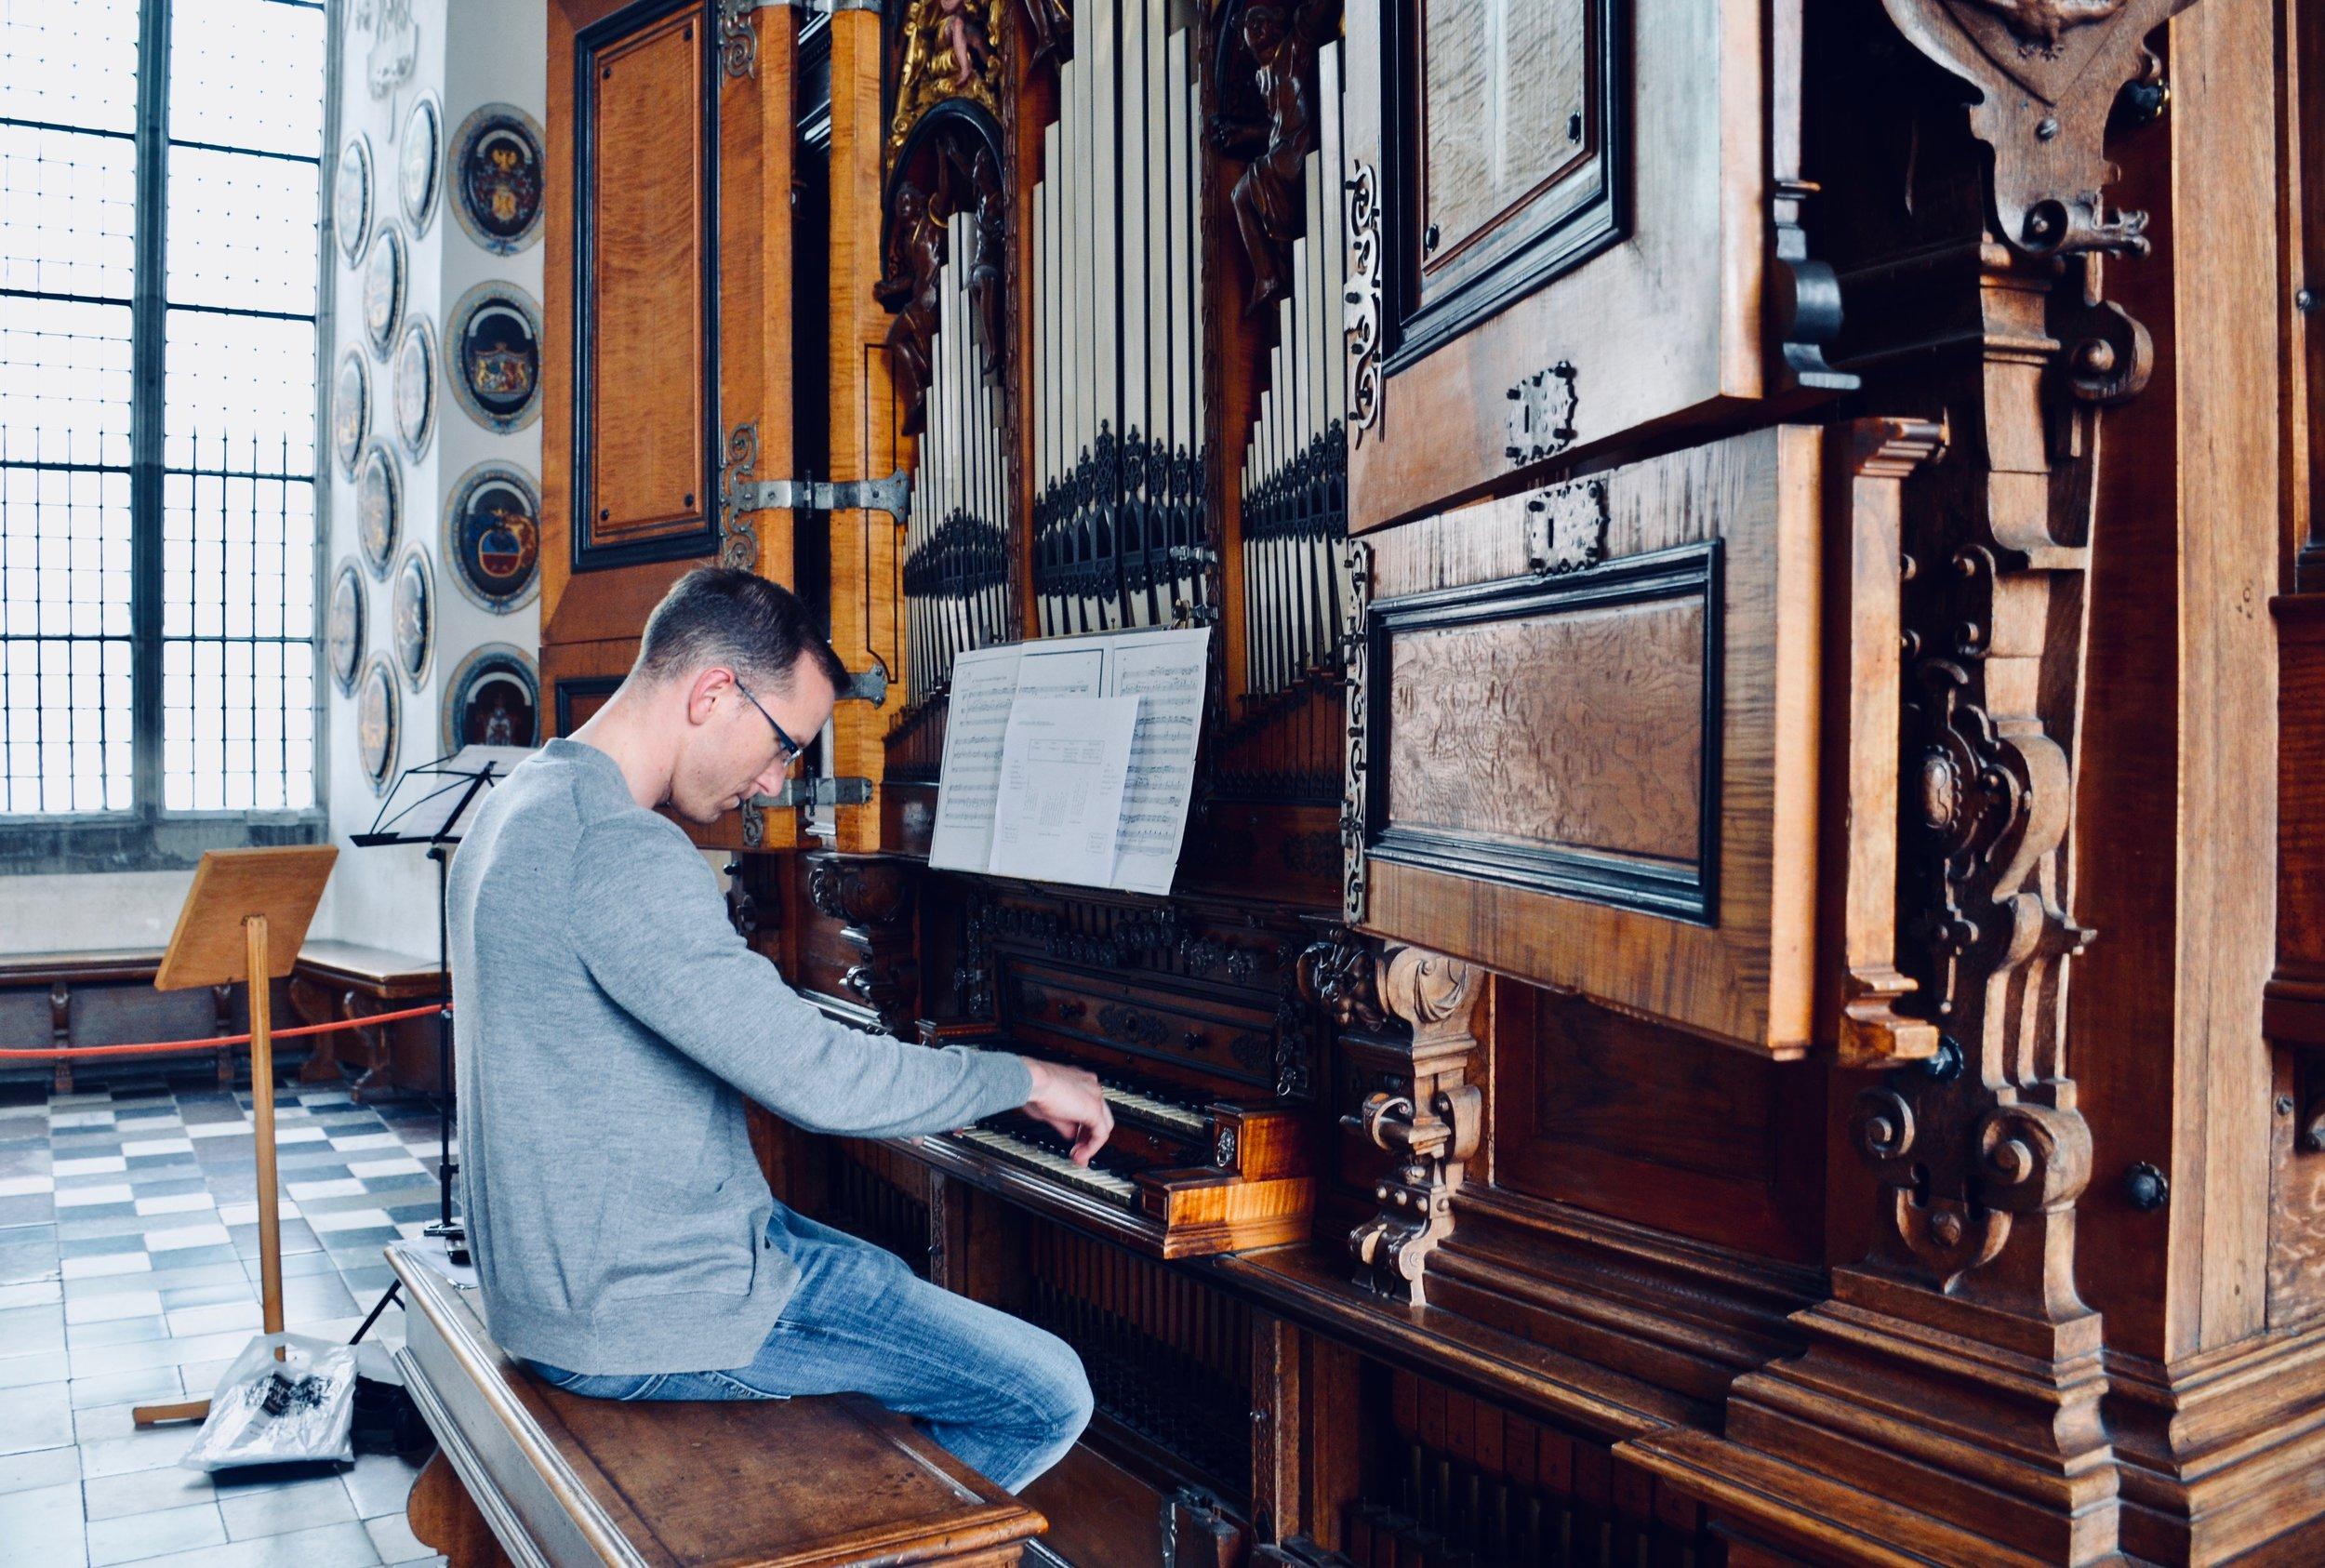 Christian Lane plays the 1610 Compenius organ, Frederiksborg Castle, Hillerød, Denmark.